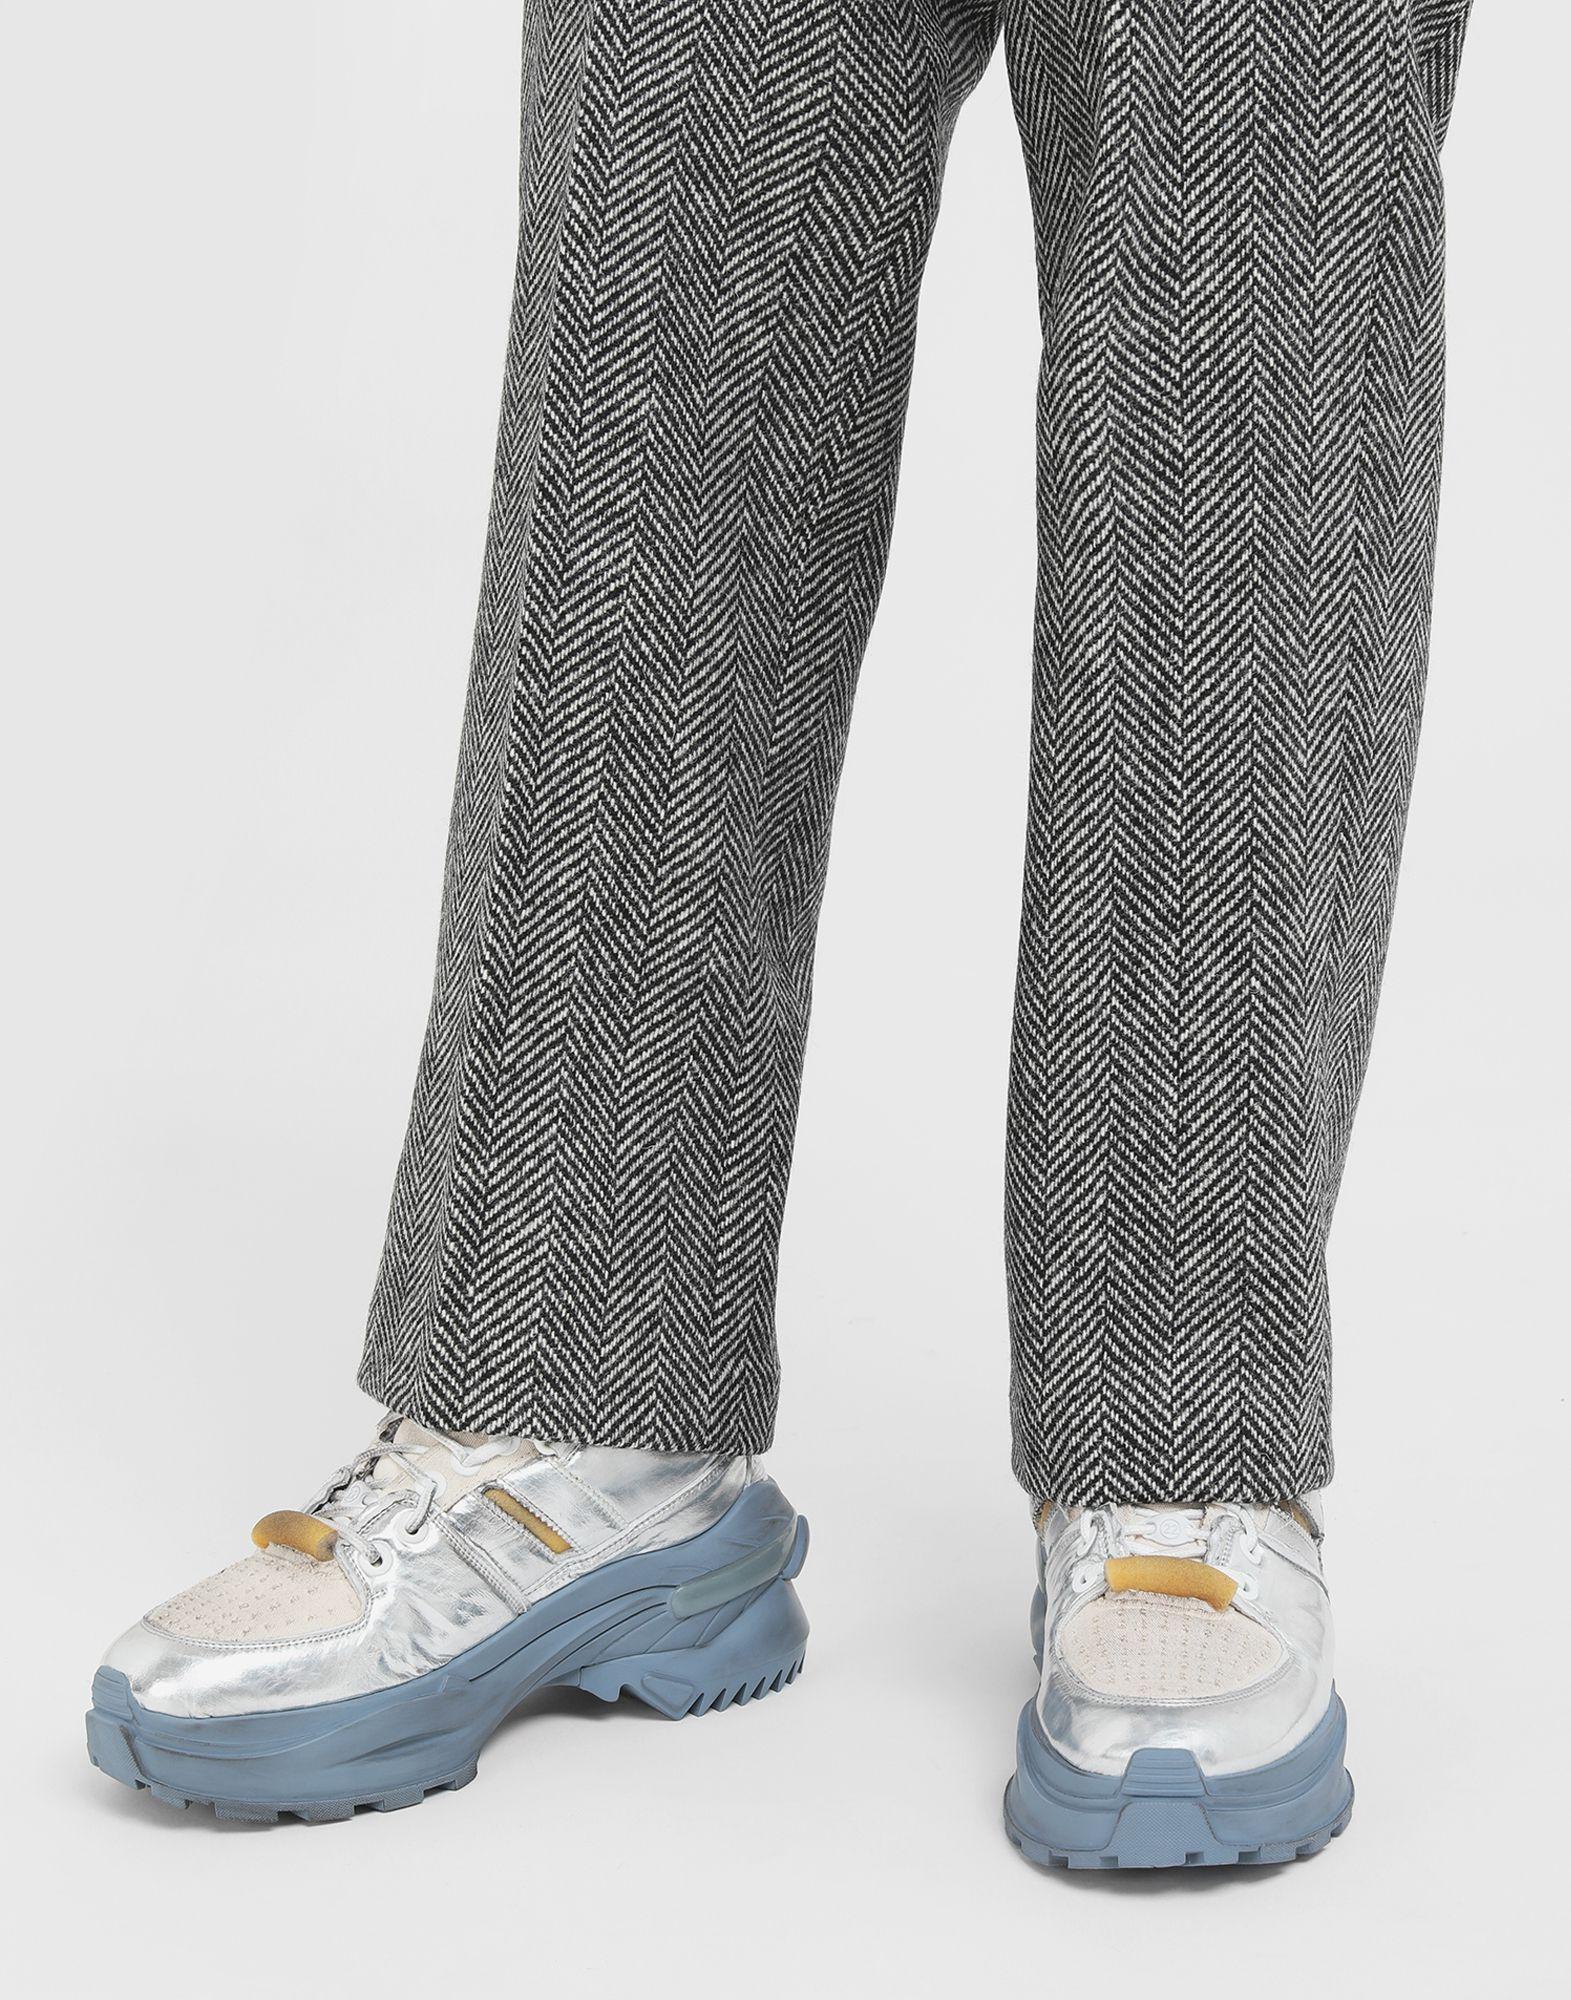 MAISON MARGIELA Retro Fit sneakers Sneakers Man r